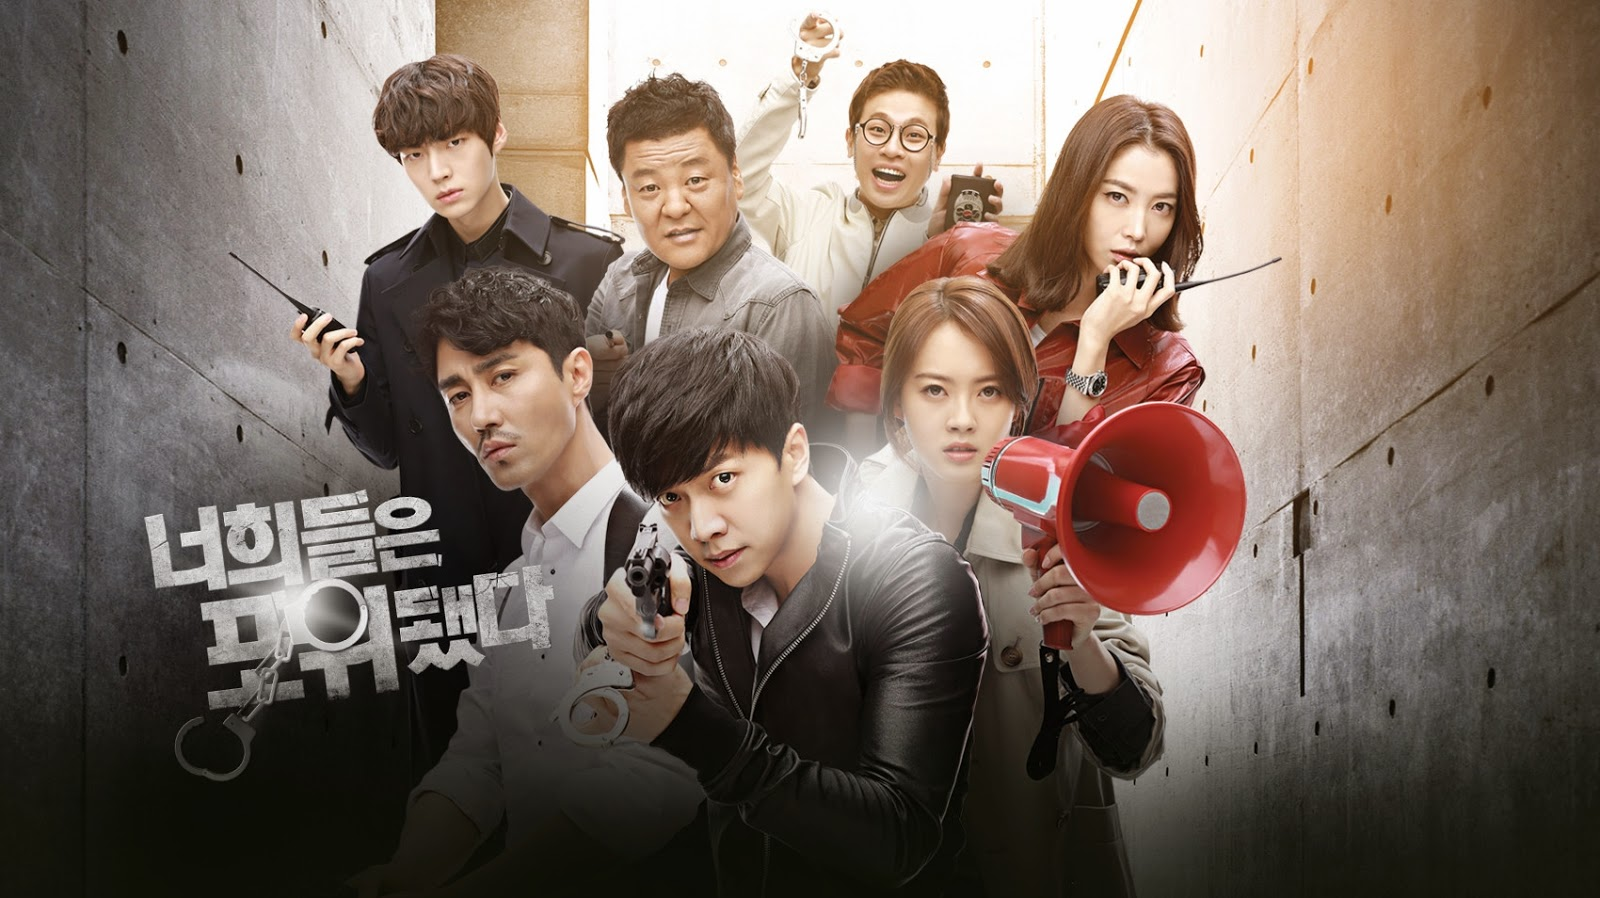 drama terbaru Ahn jae hyun